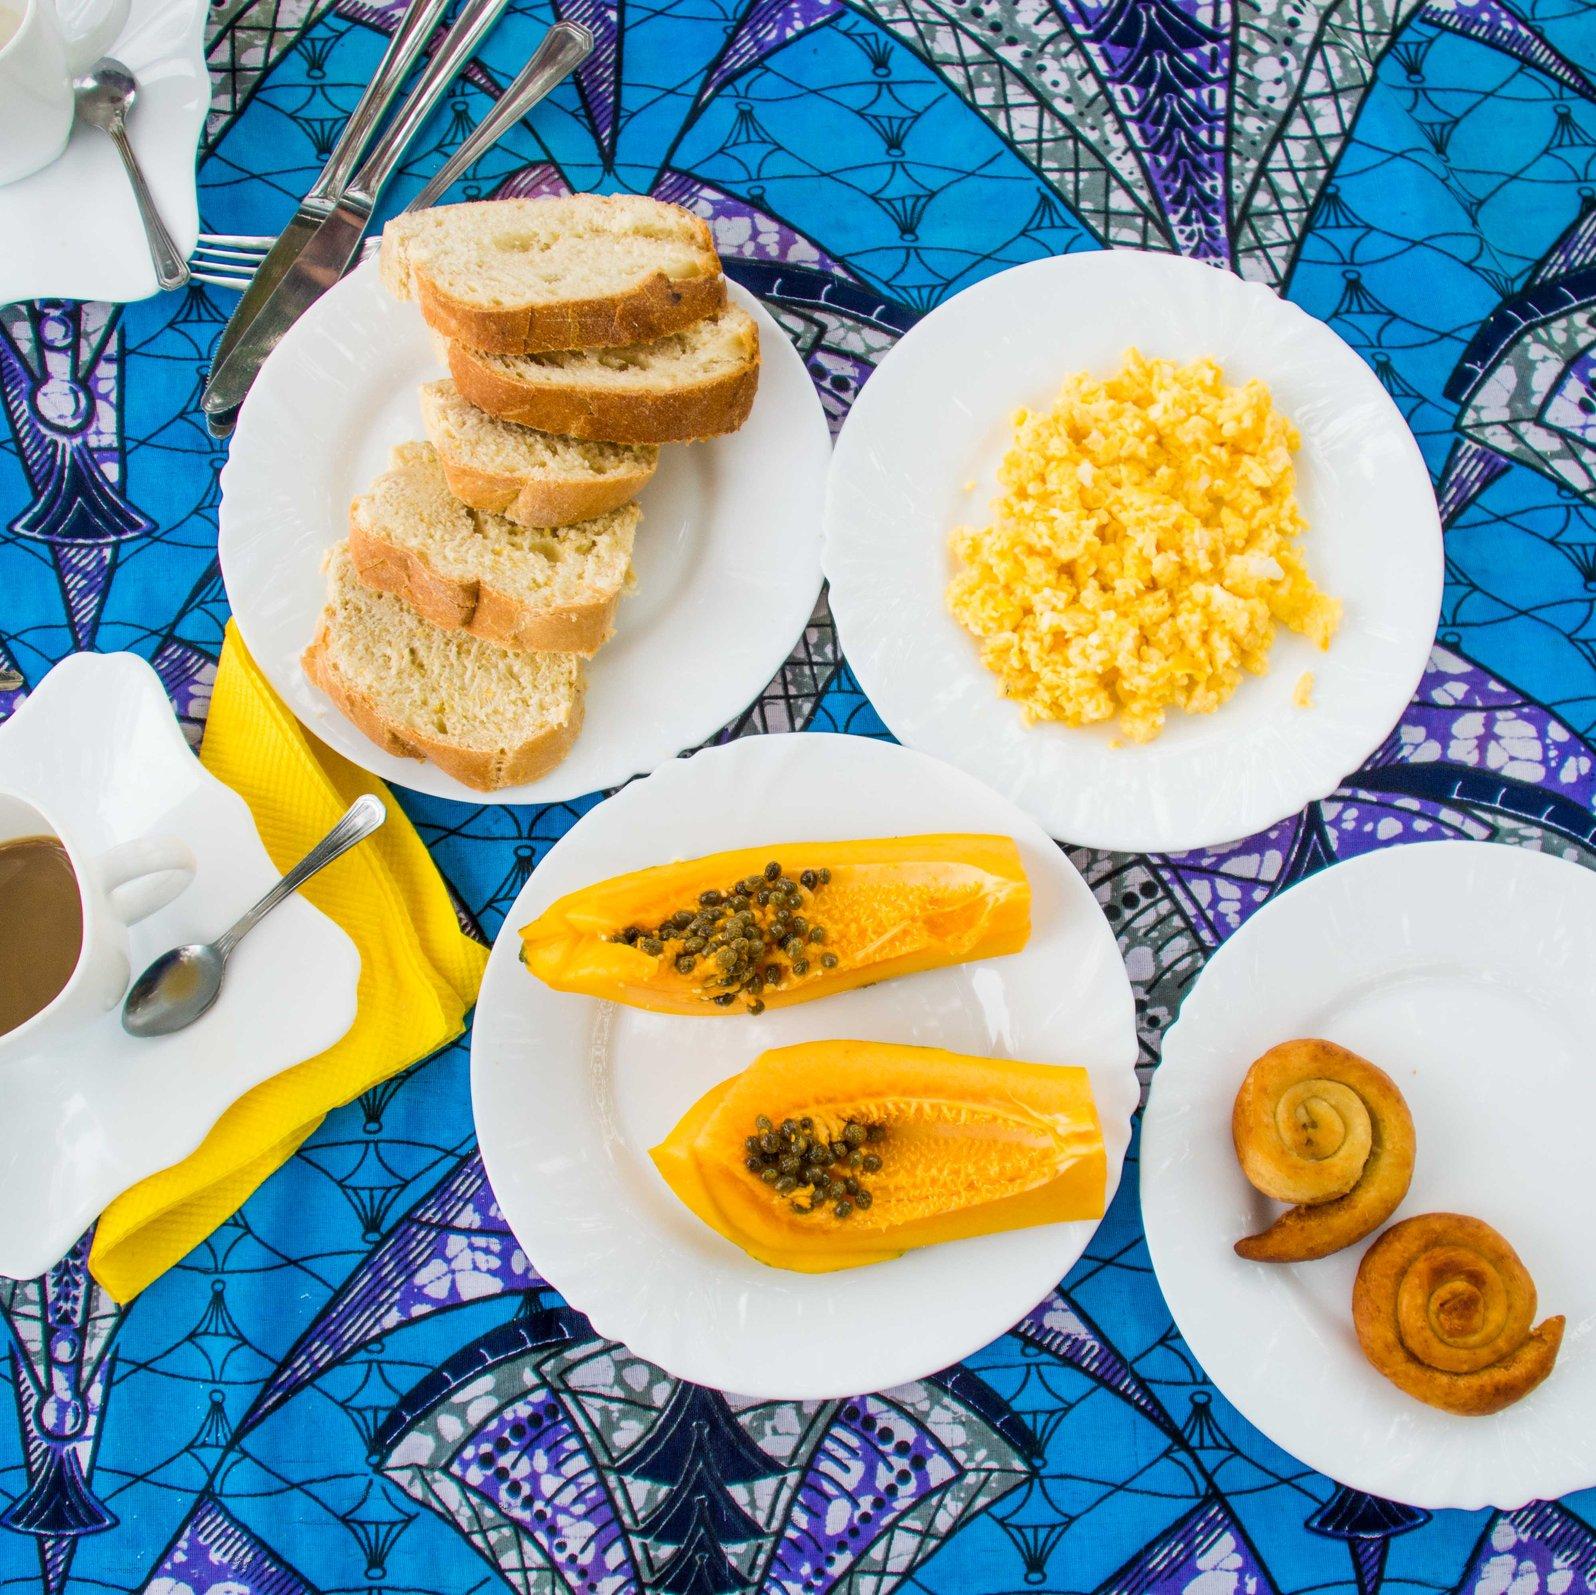 sliced papaya fruits, scramble egg, loaves of bread on white ceramic plates